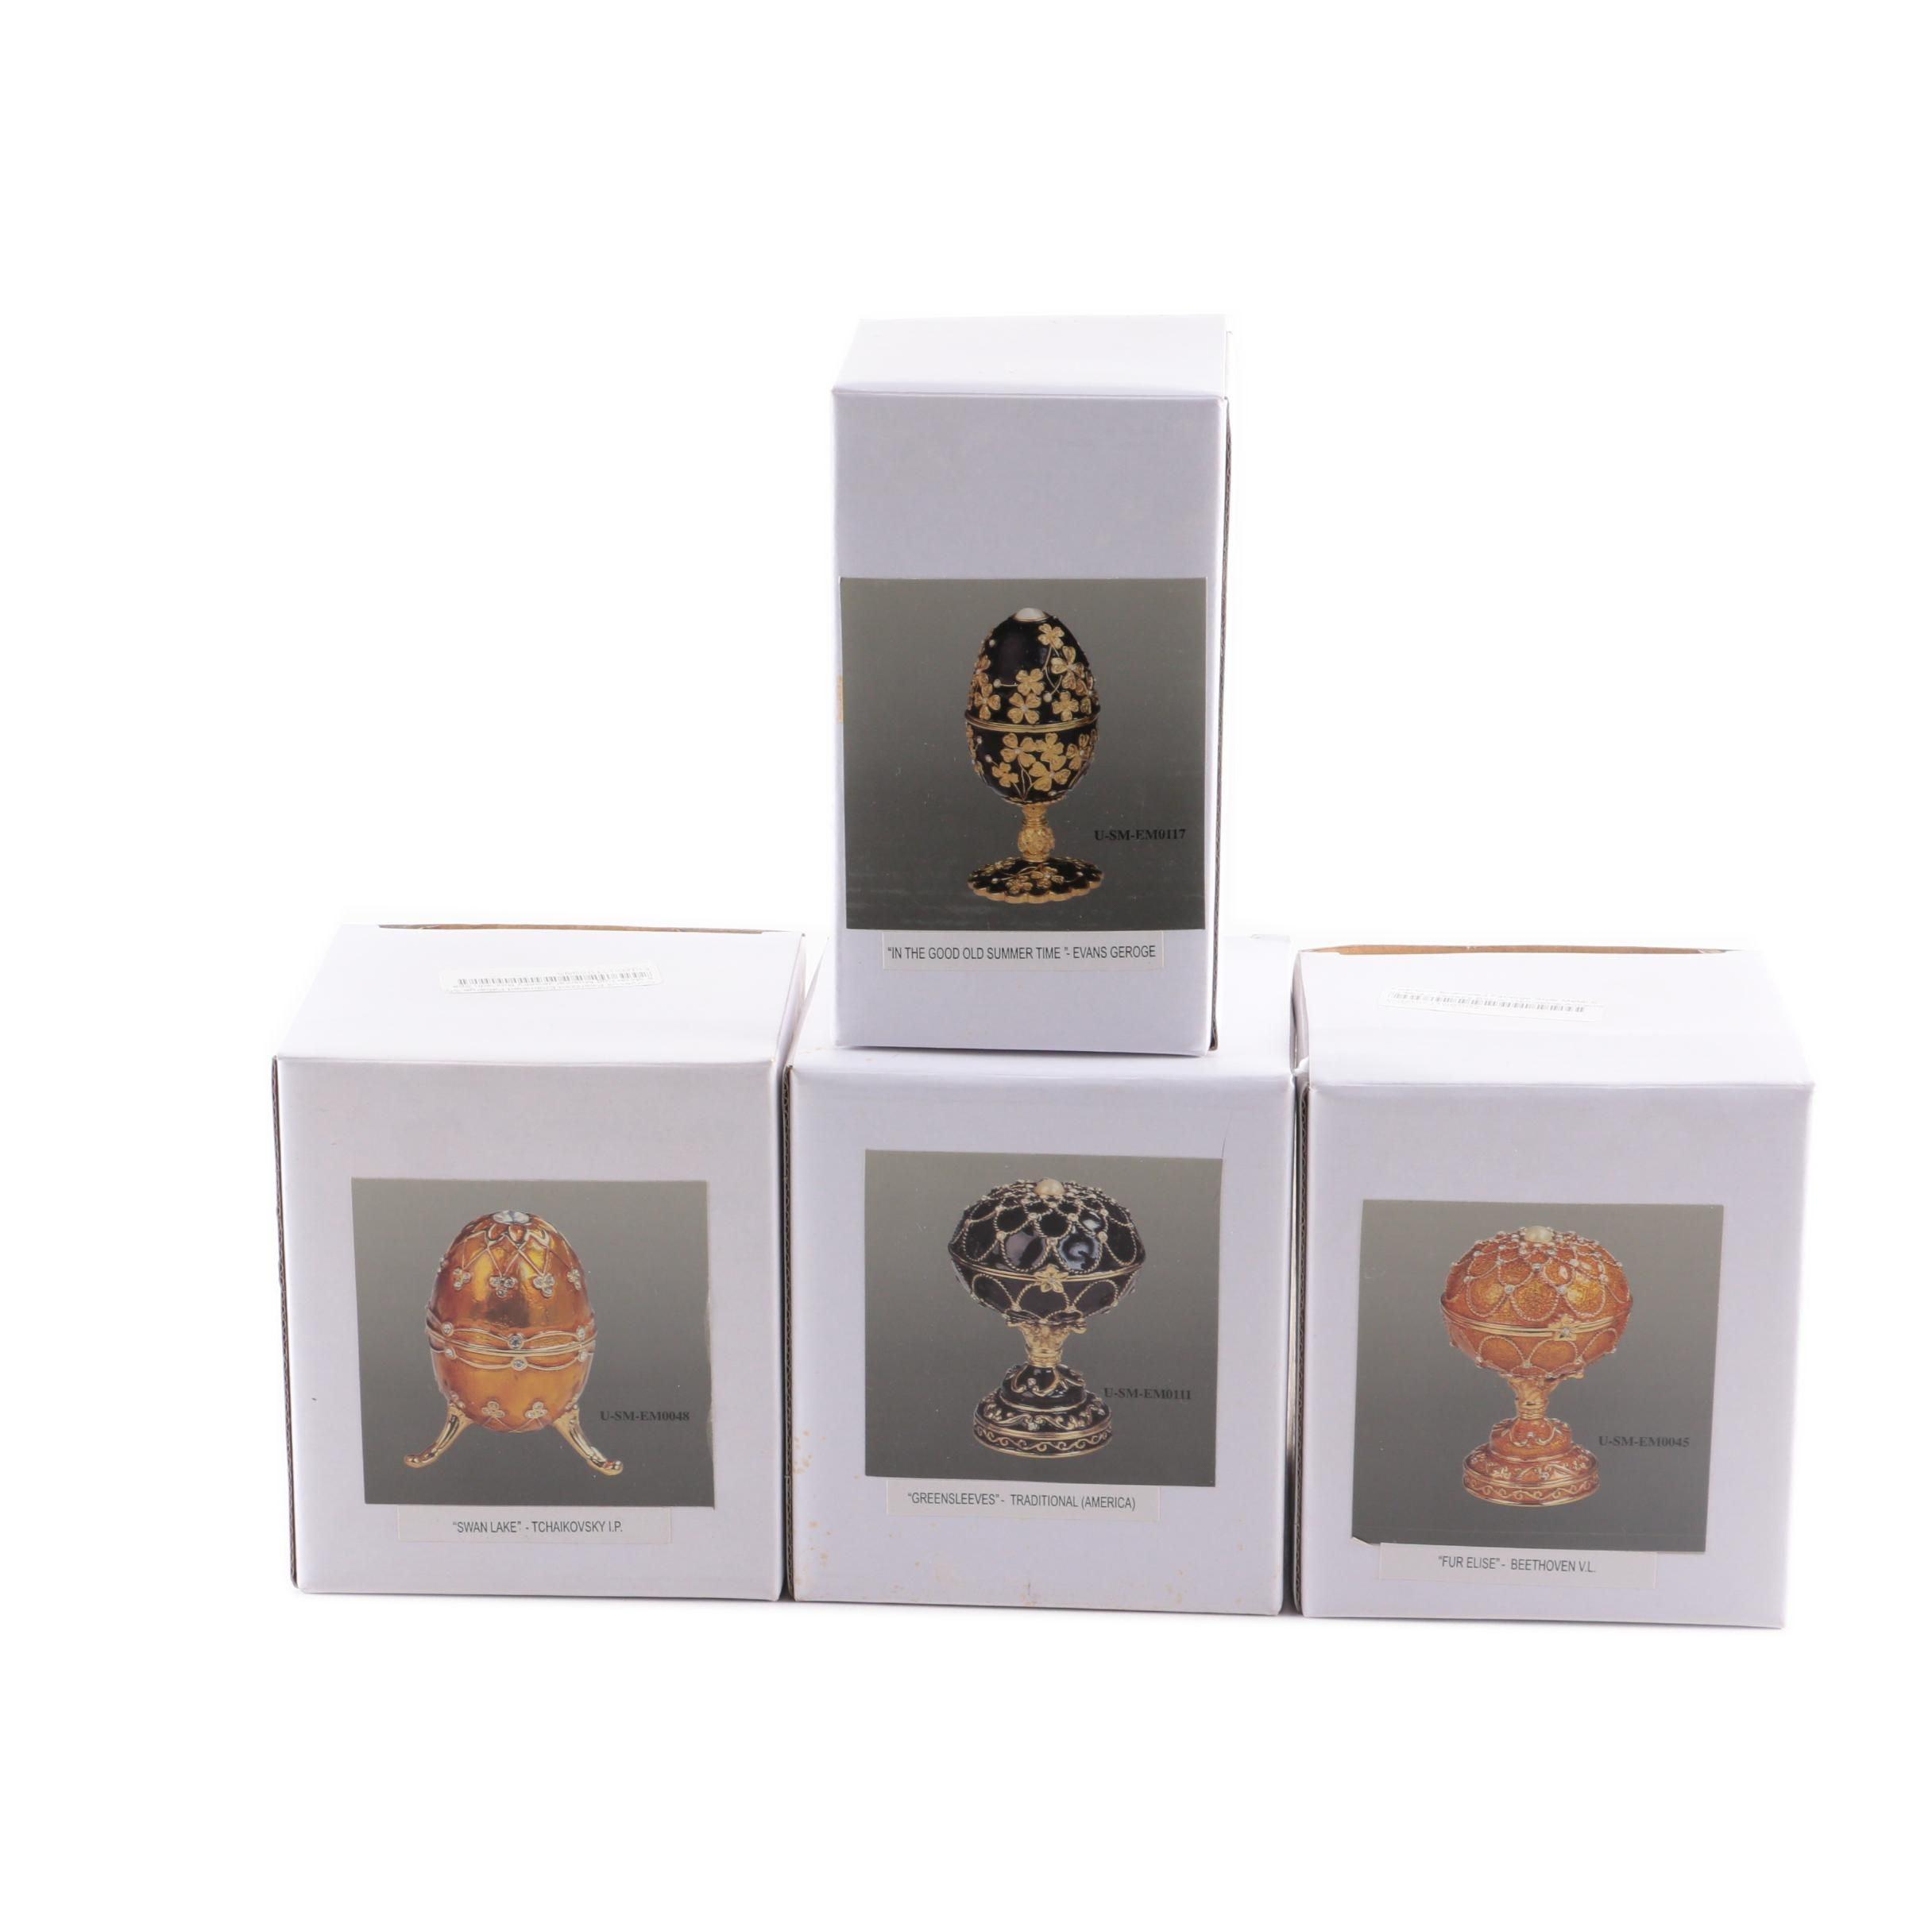 Fabergé Style Egg Music Boxes